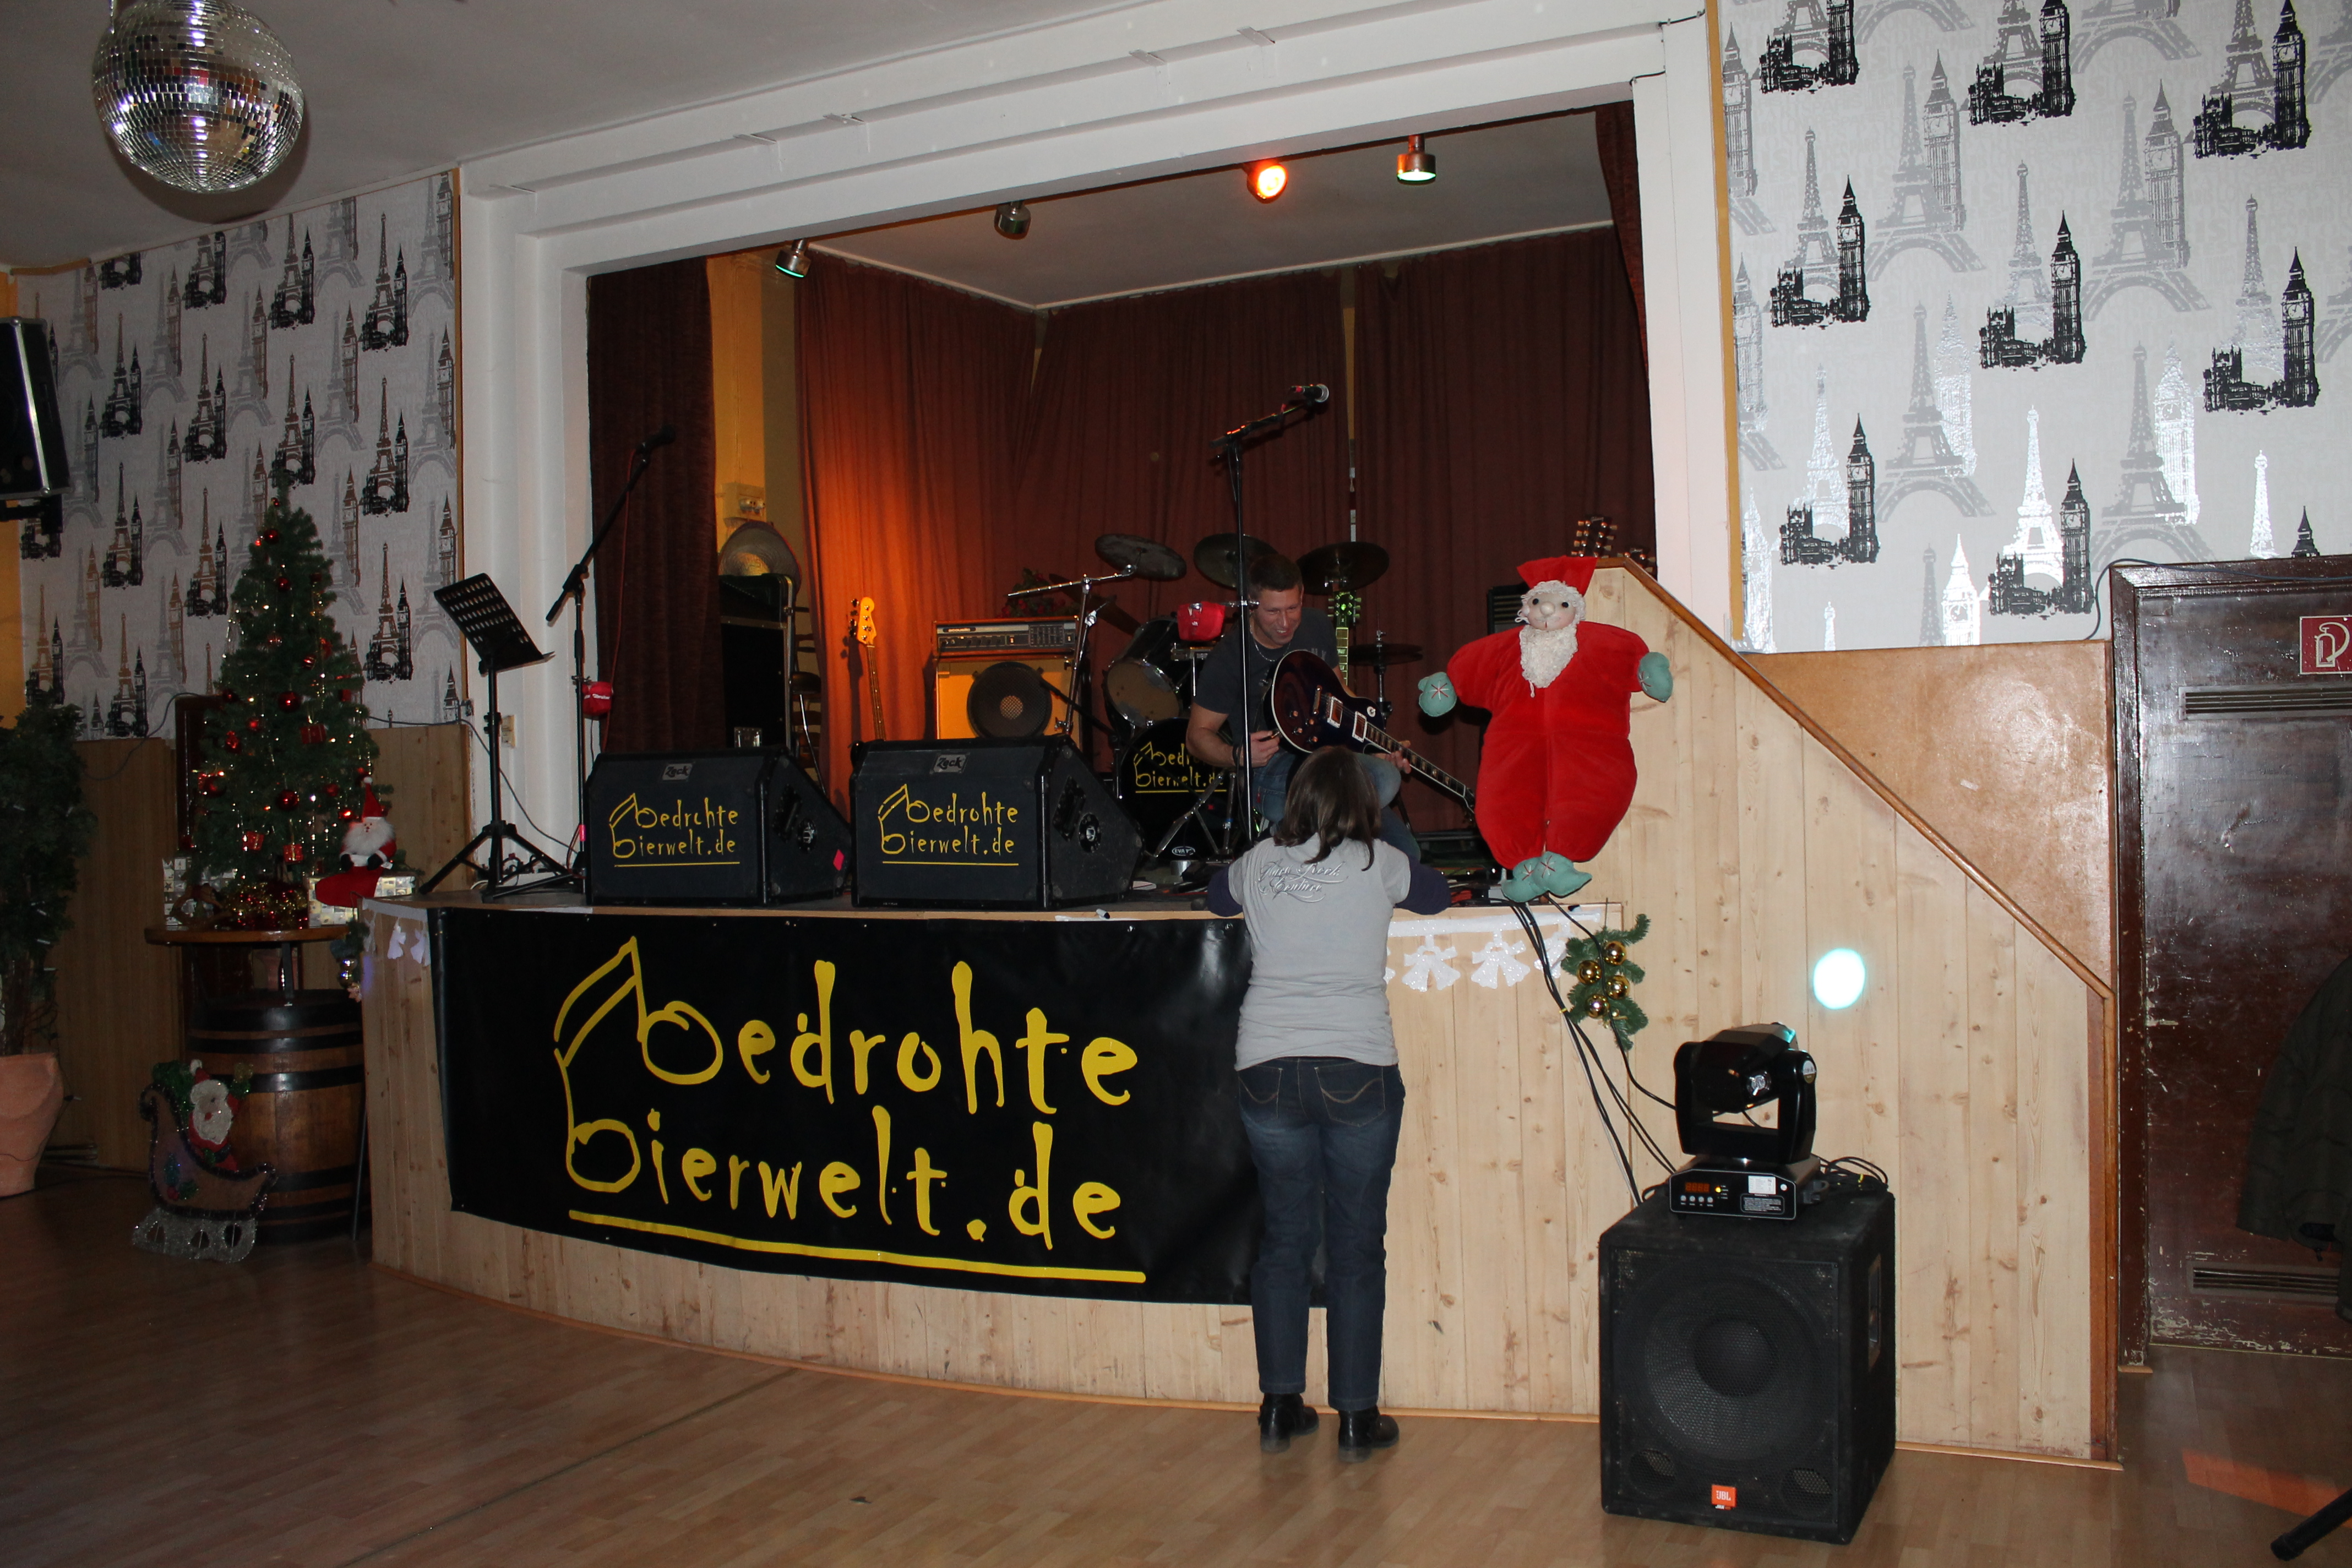 2013-12-21 Michels Geburtstag gr Canon (9)